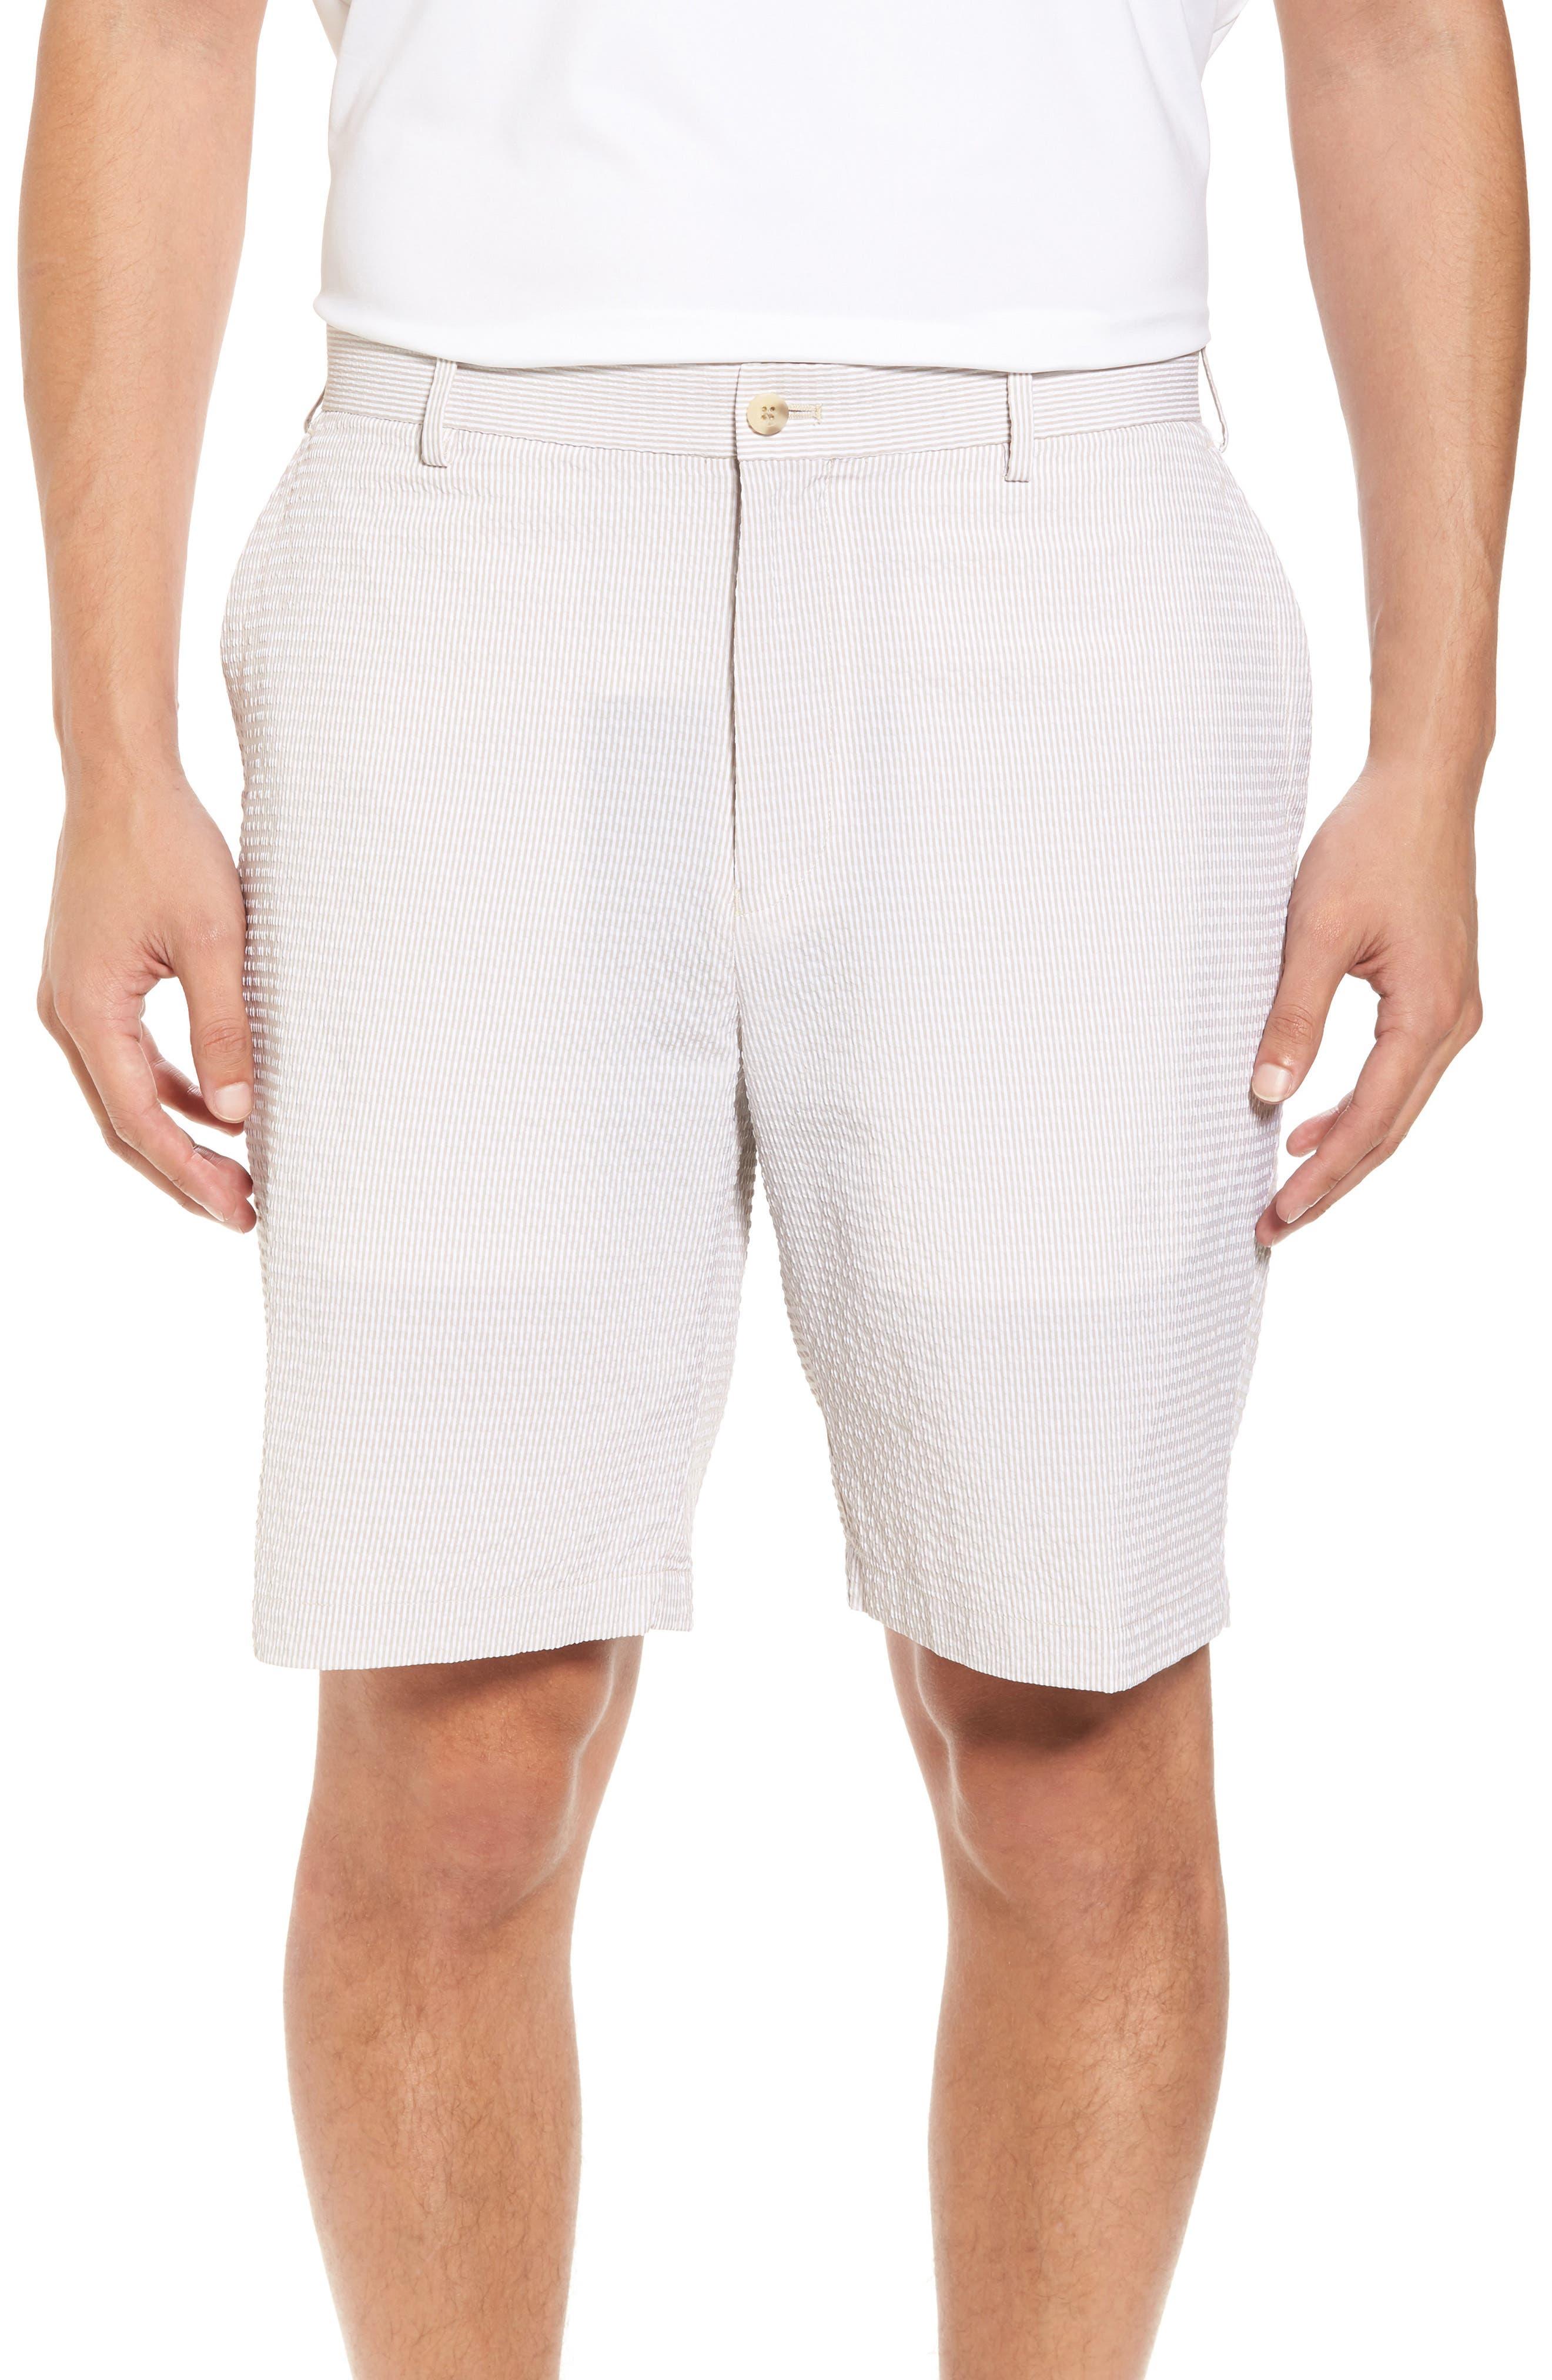 Apex Pinstripe Seersucker Shorts,                             Main thumbnail 1, color,                             260